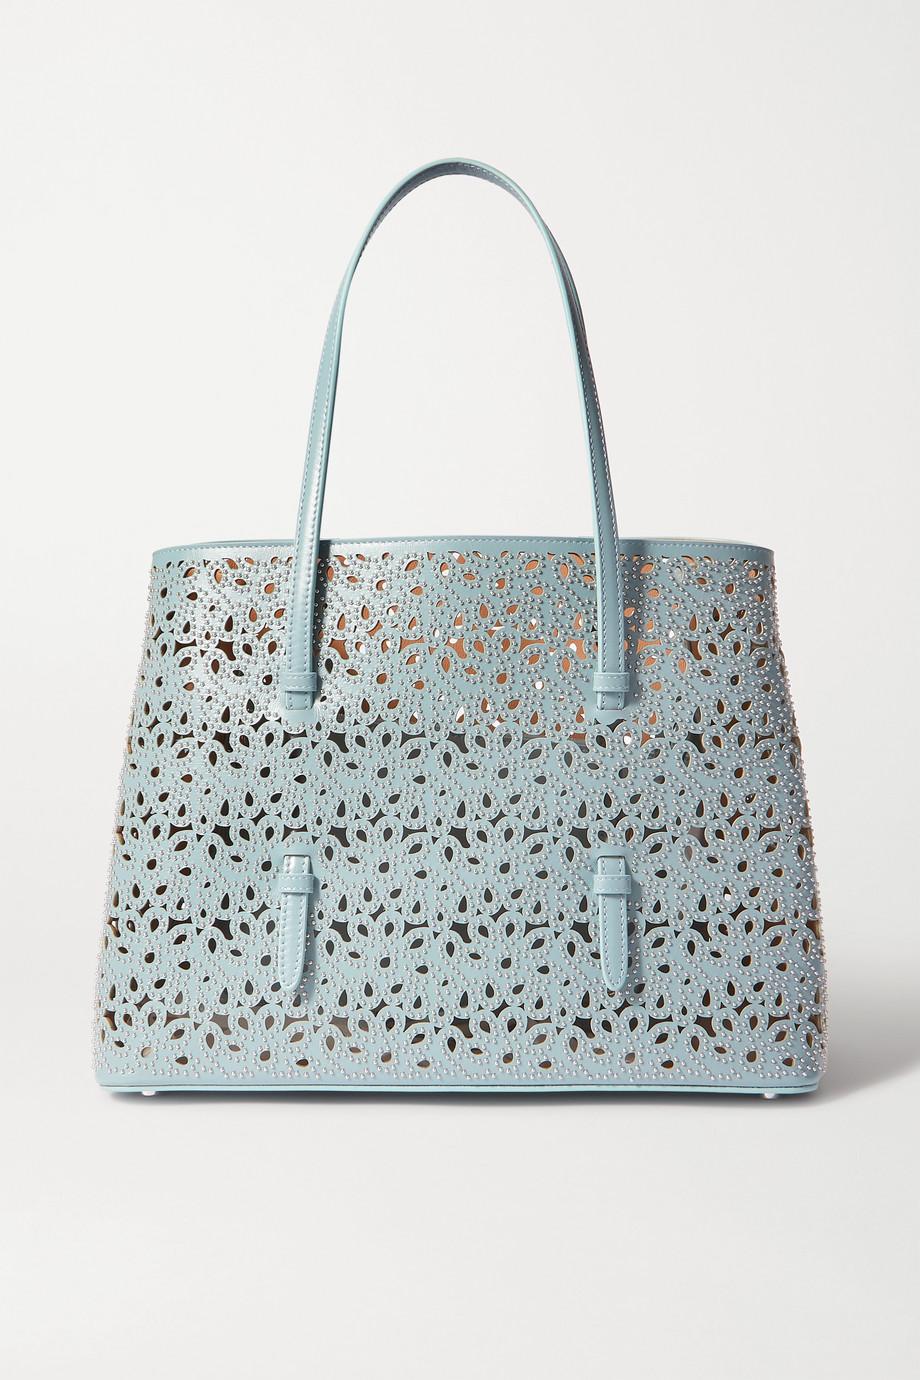 Alaïa Mina medium studded laser-cut leather tote